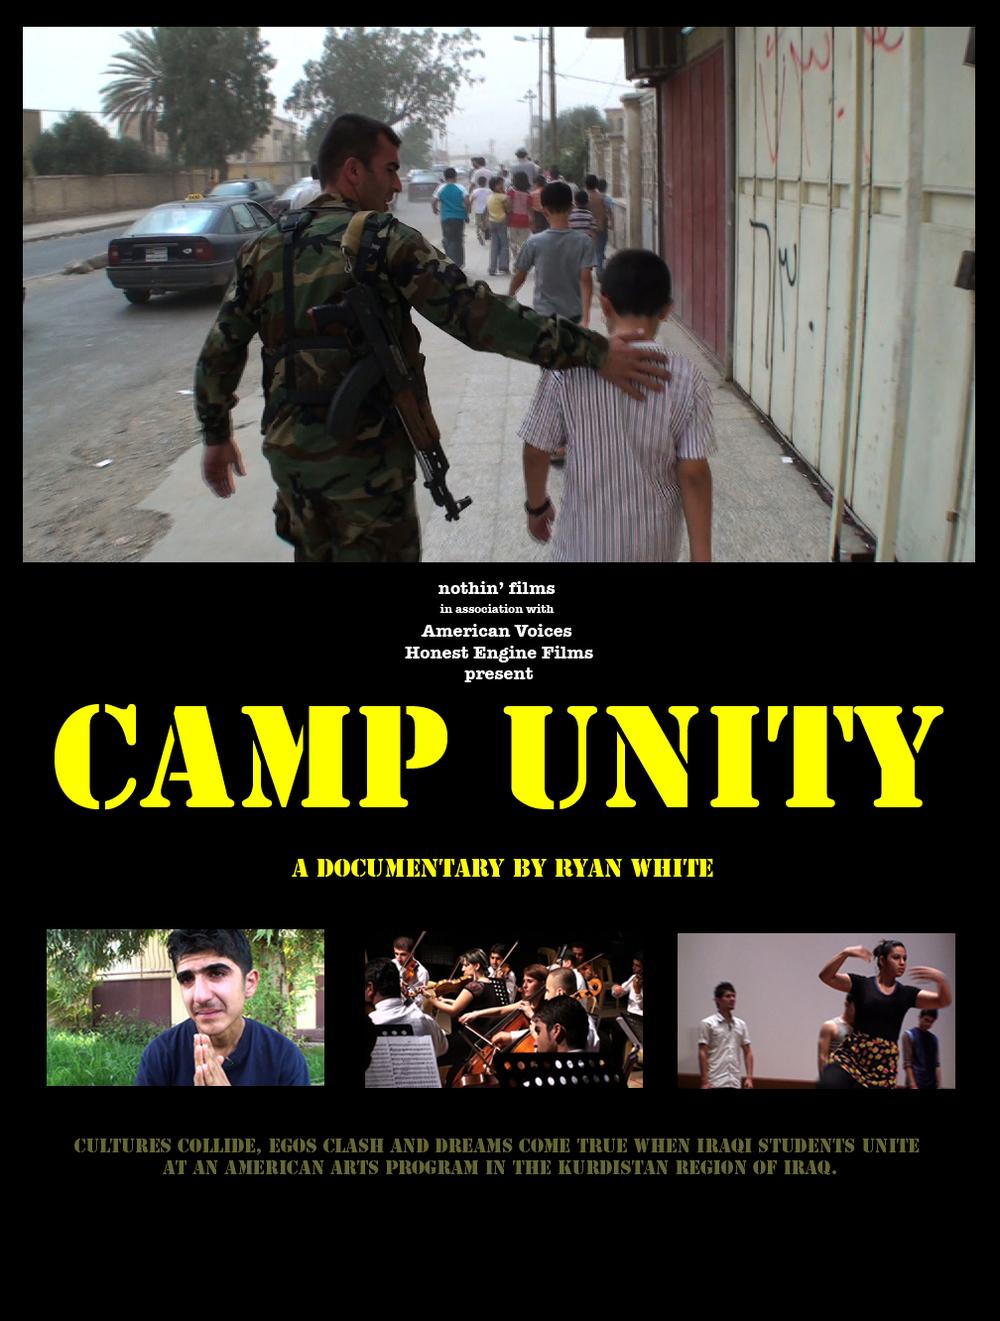 CAMP UNITY (2010)